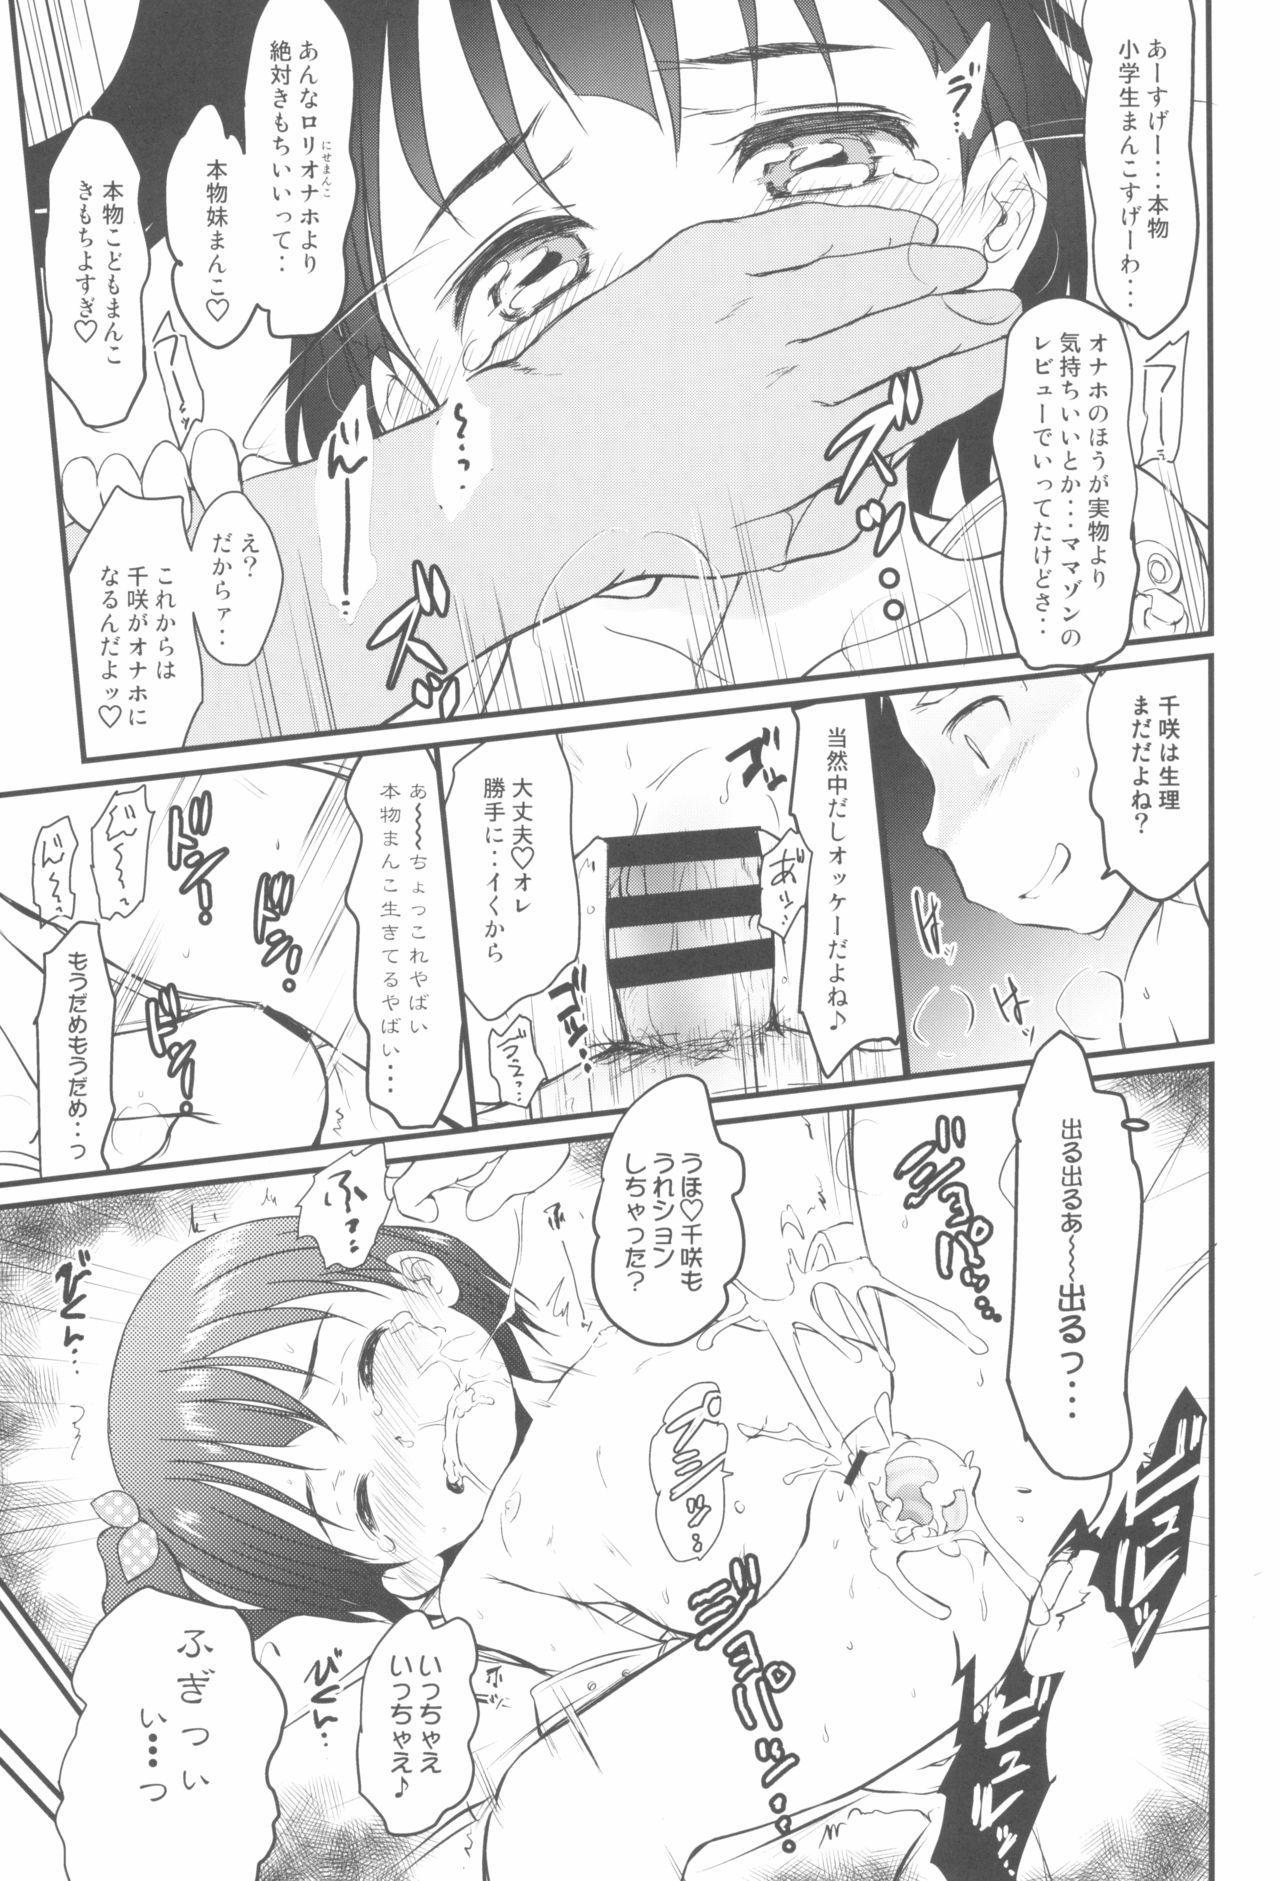 (C97) [Wancho-ke (Wancho)] Imouto wa Minna Onii-chan ga Suki! 5-Kaiteiban- 20